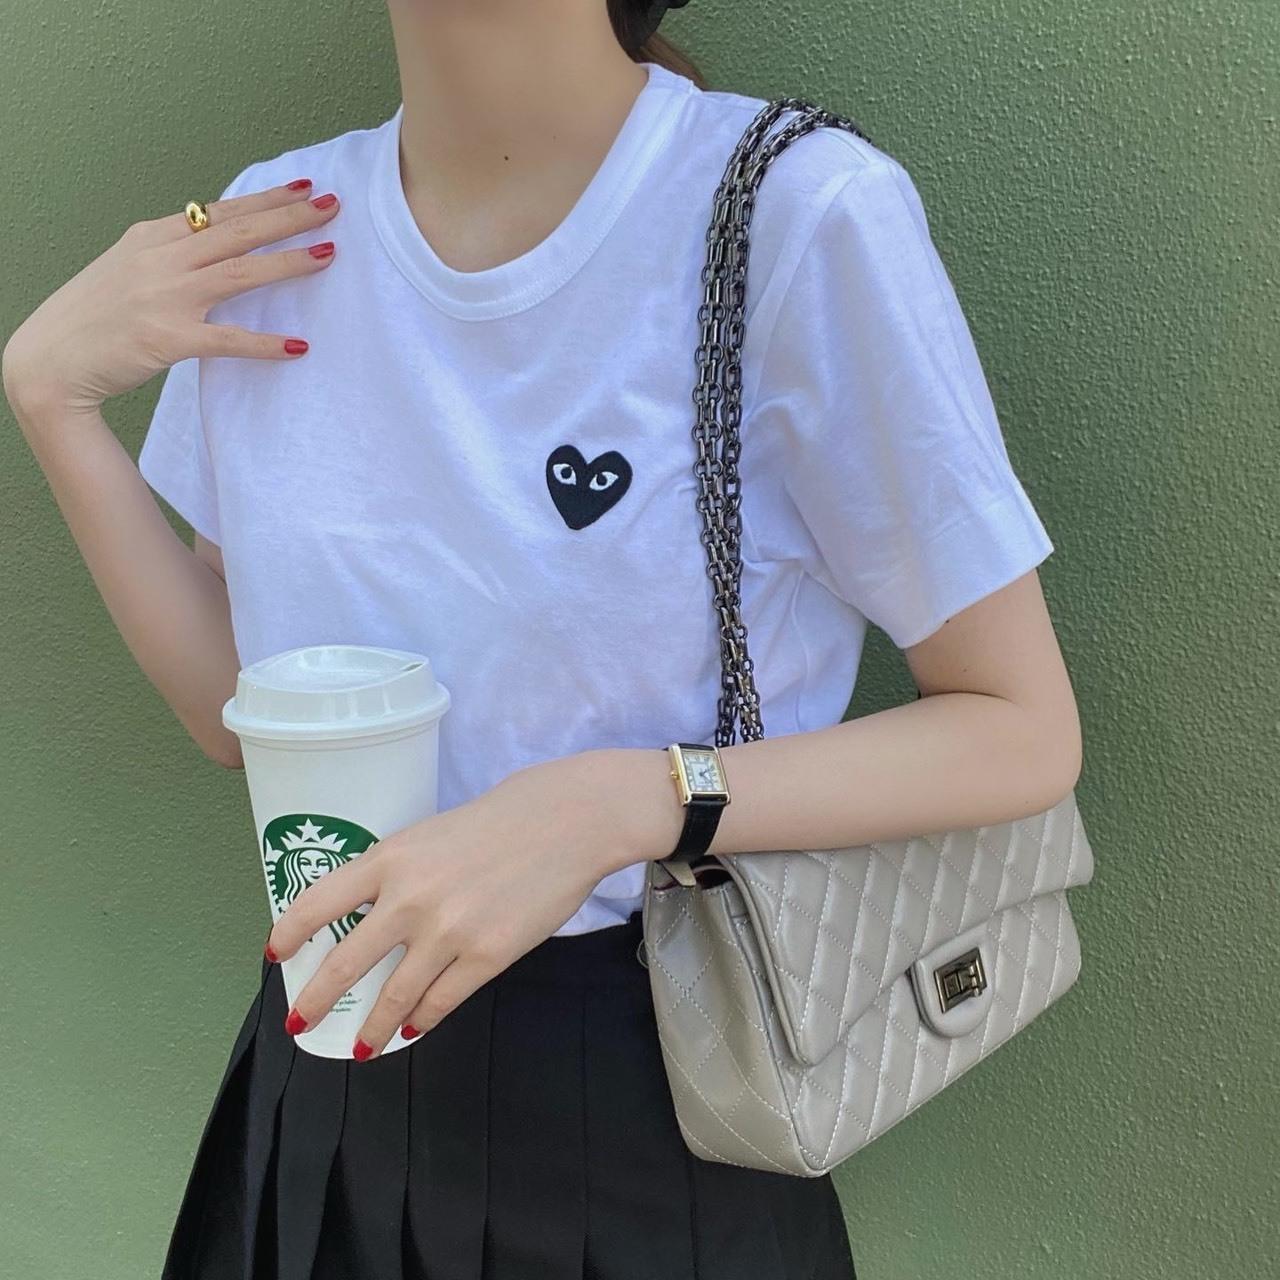 【7/11】DAYNYC flap bag(gray)